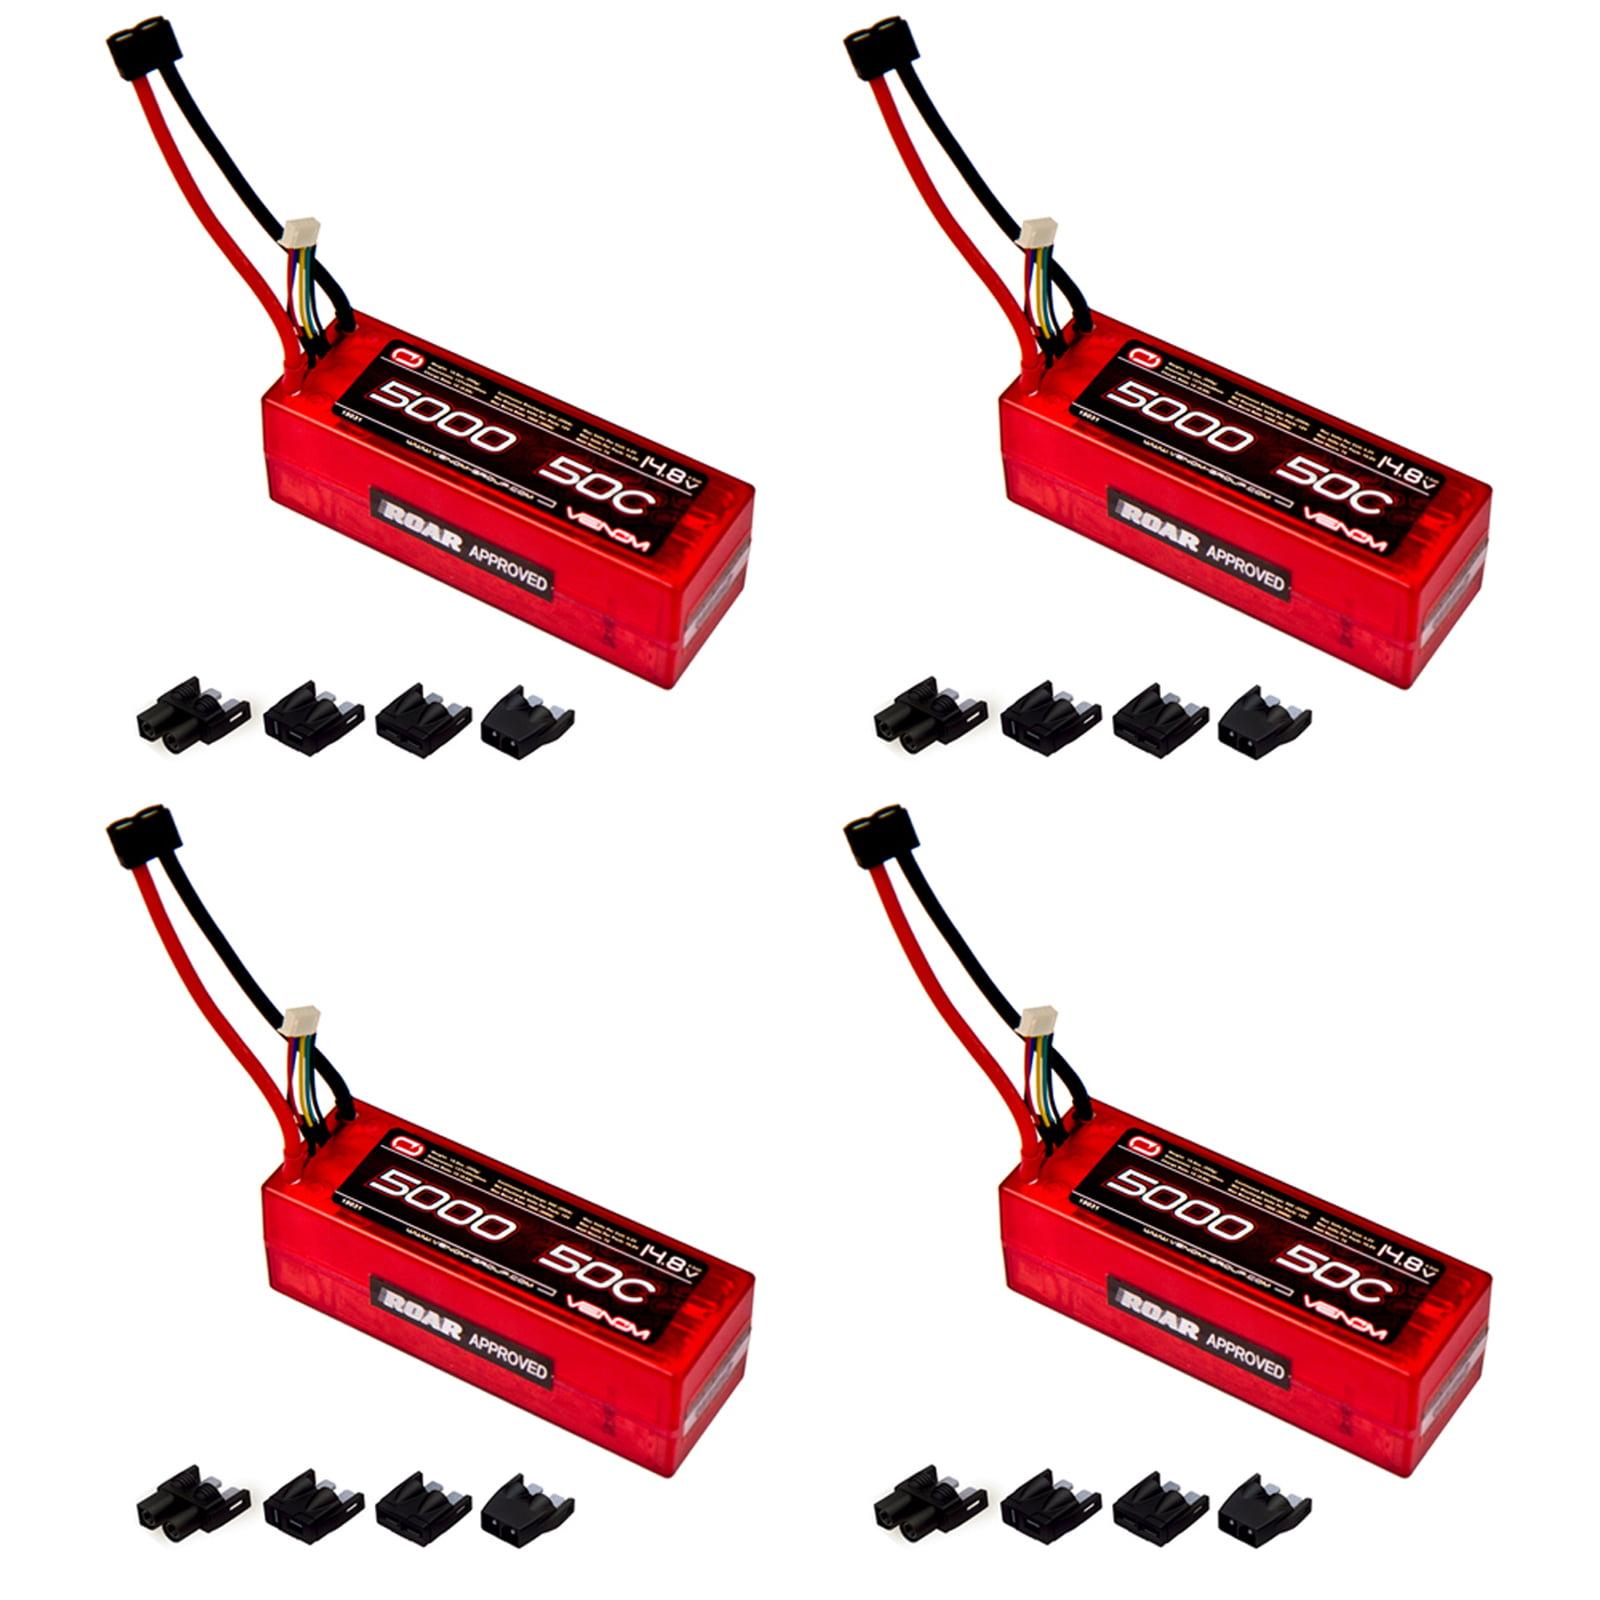 Venom 50C 4S 5000mAh 14.8V Hard Case LiPo Battery ROAR with Universal Plug (EC3/Deans/Traxxas/Tamiya) x4 Packs